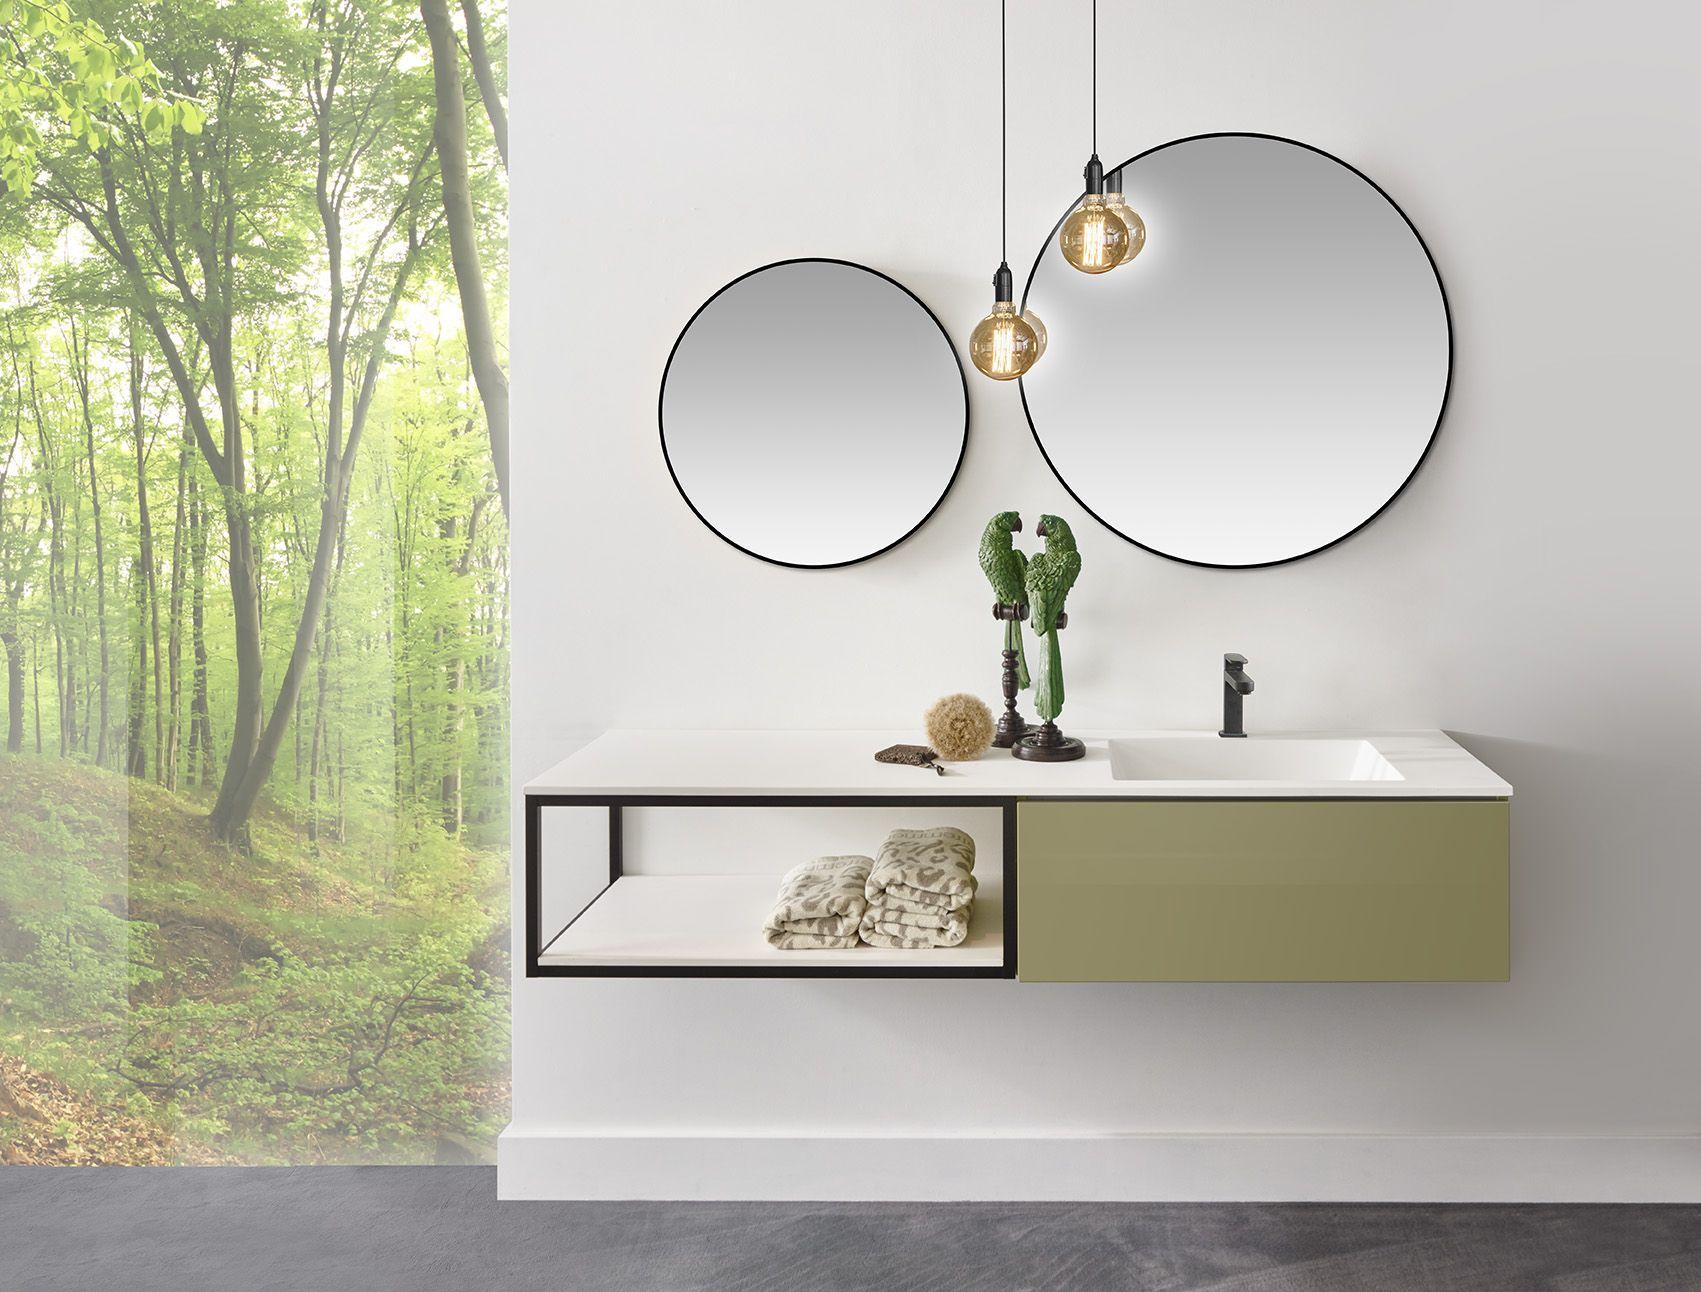 Zwarte Ronde Spiegel : Ronde zwarte spiegel met old green gelakt meubel open frame